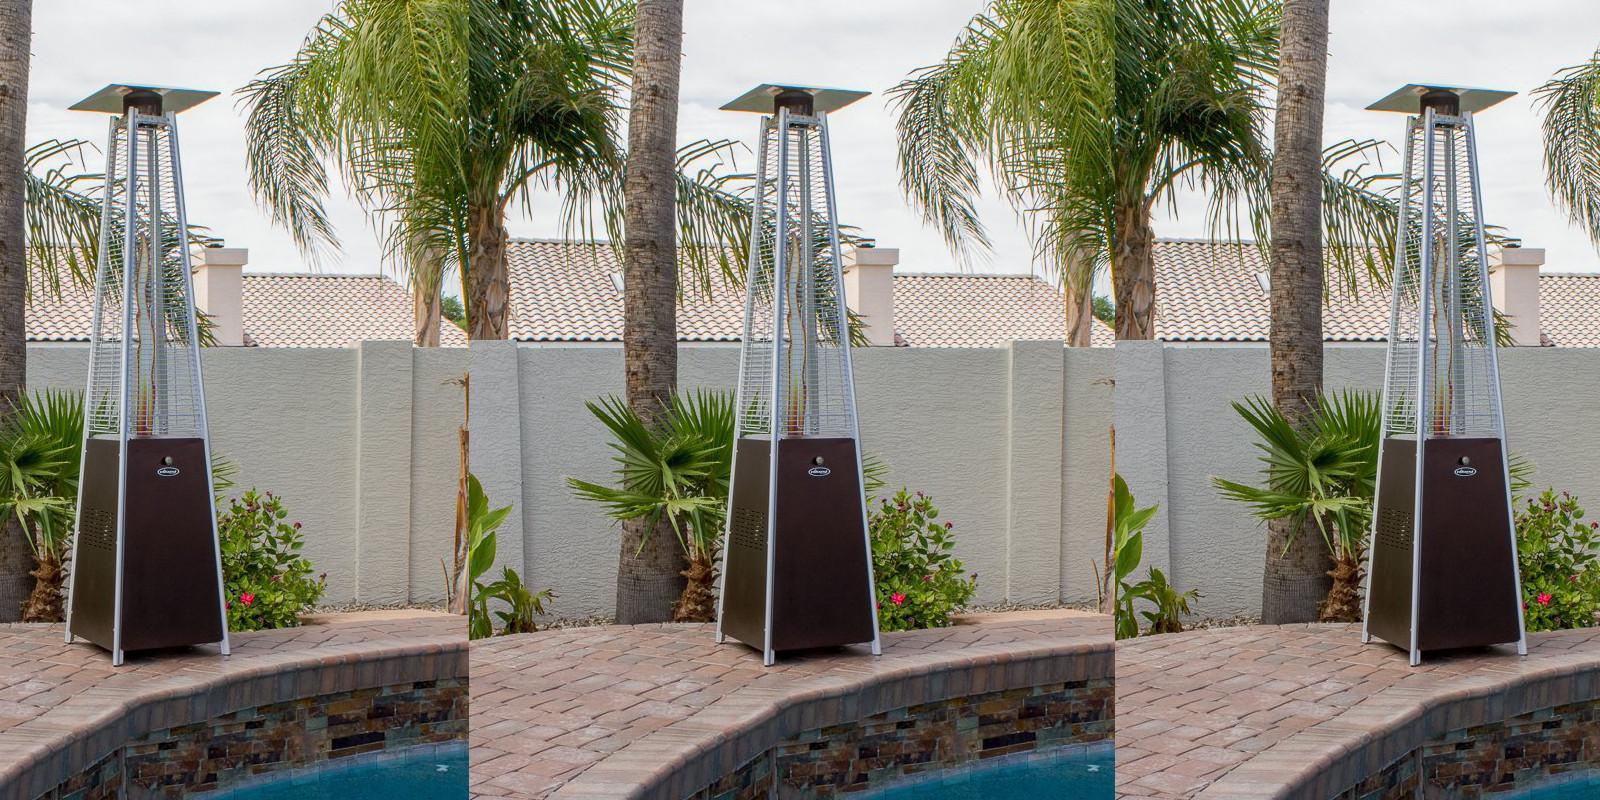 Amazon Offers The AZ Patio Heater In Quartz Glass/Bronze For $157.50 (Reg.  $195+)